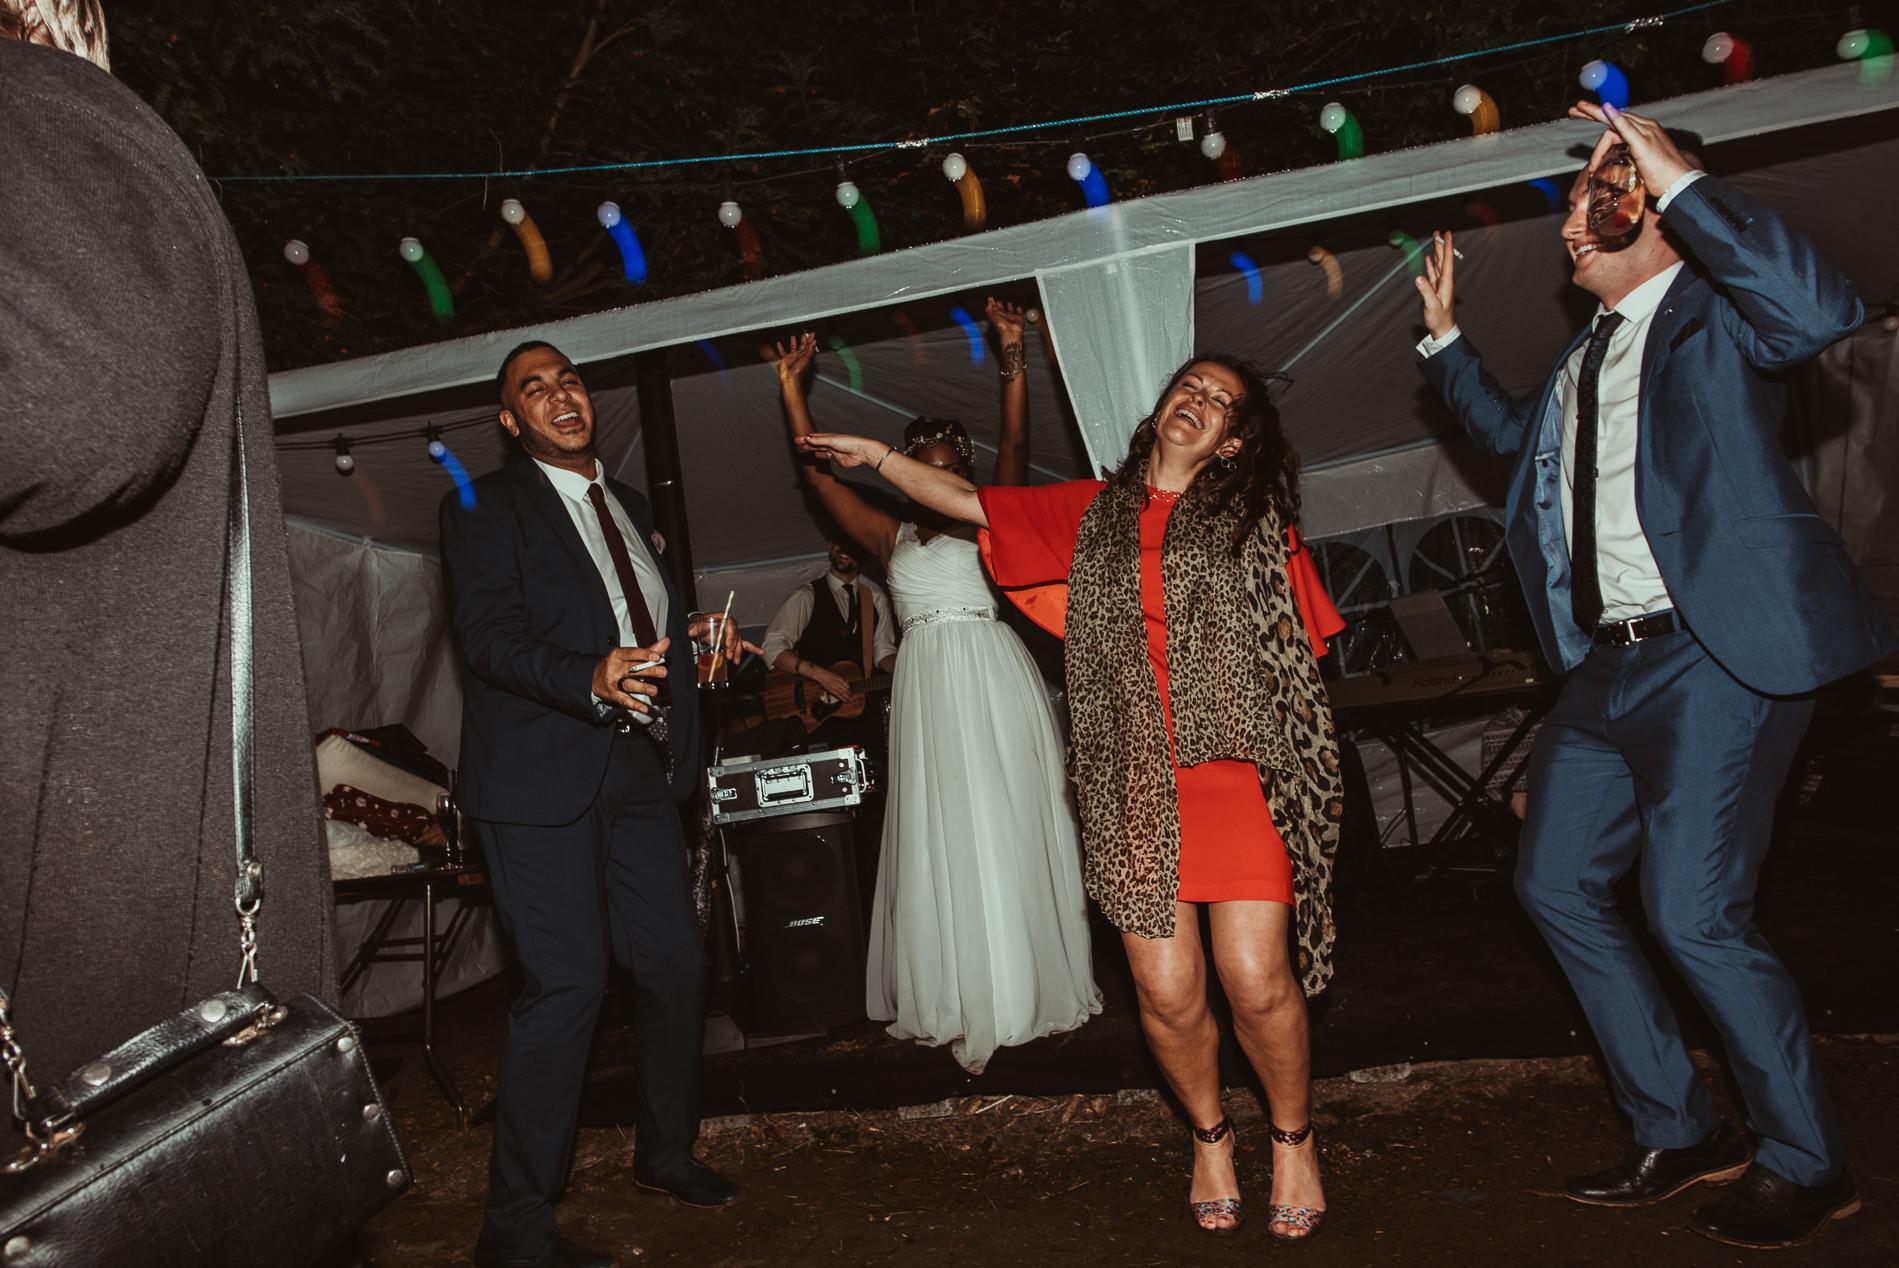 bohemian_wedding_lawshall_church_garden87